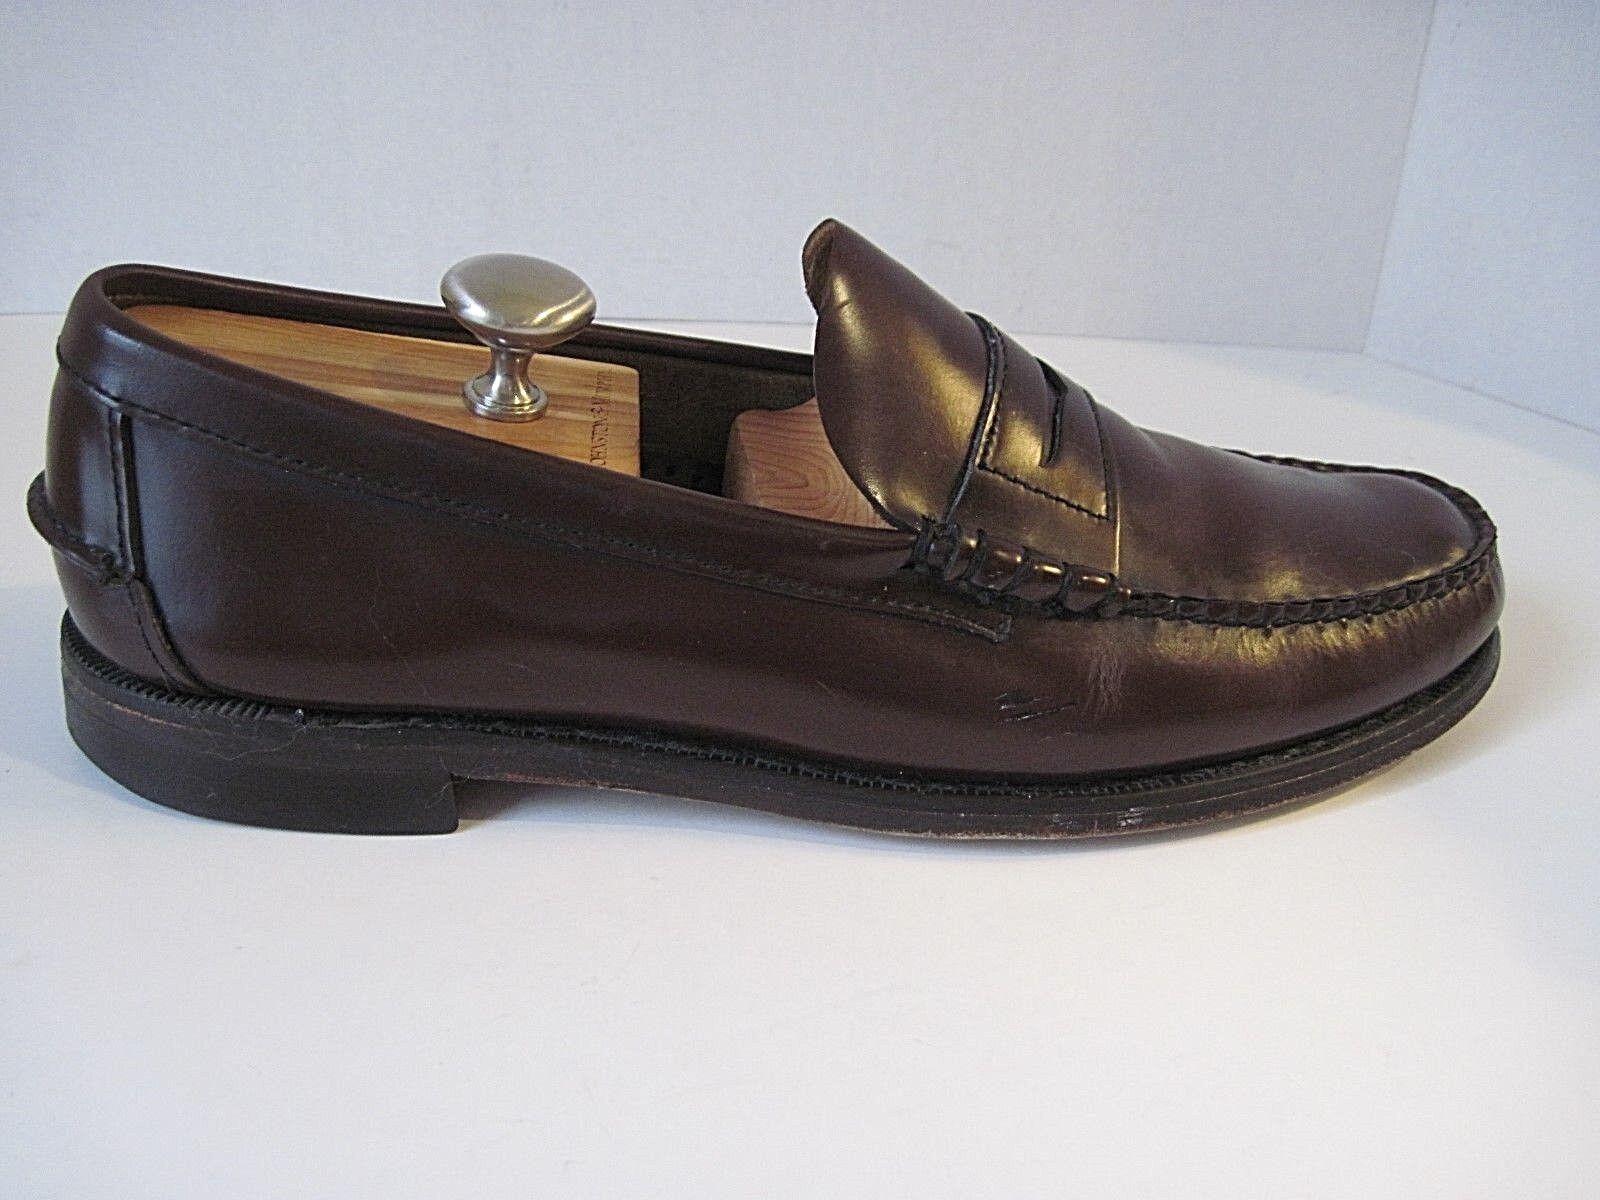 SEBAGO SEBAGO SEBAGO Burgundy Pelle Handsewn Penny Loafer Shoes Uomo Size 13D 191e05